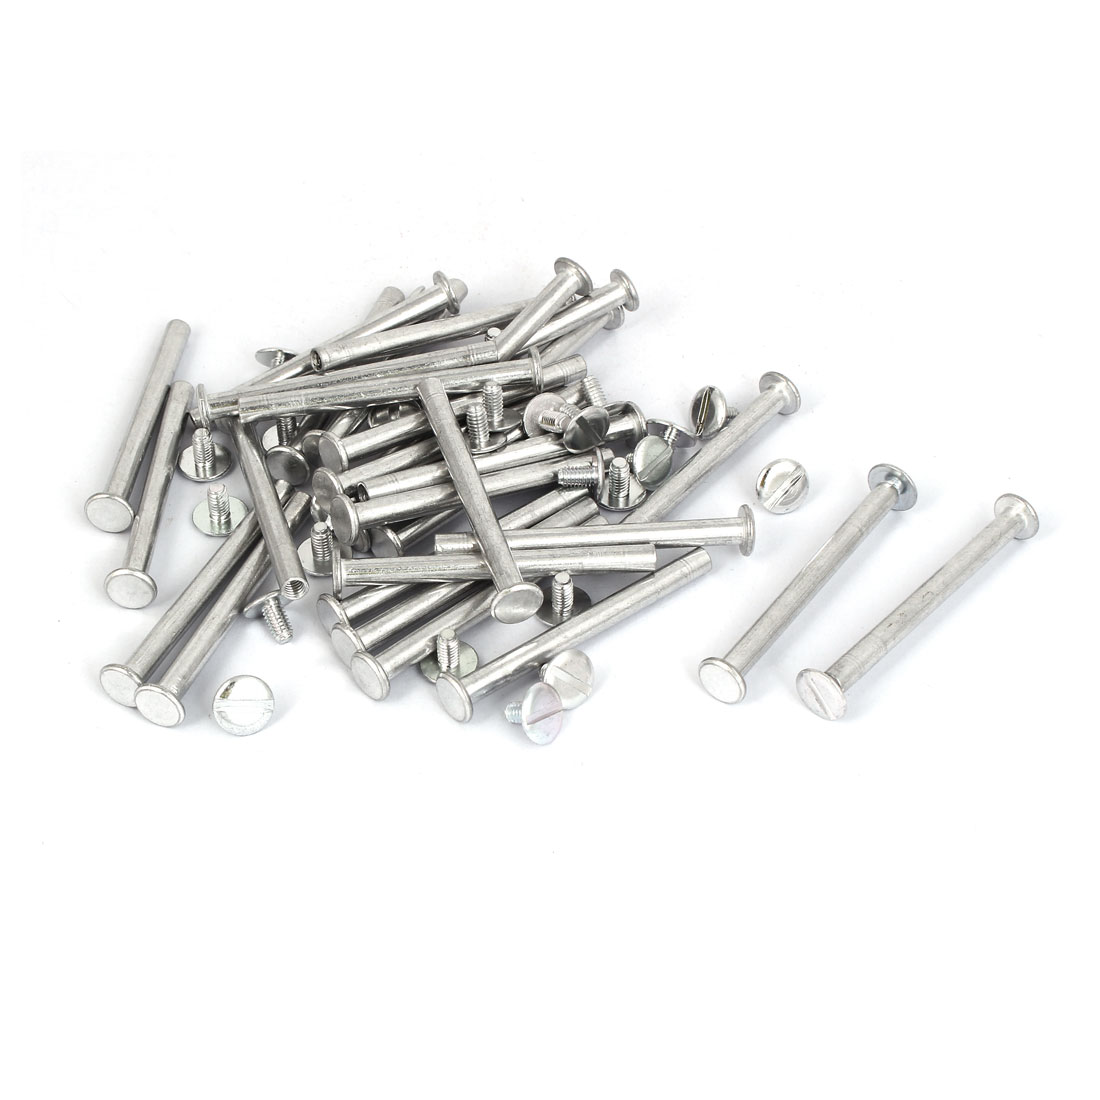 M5x55mm Aluminum Binding Screw Post 30pcs for Photo Albums Scrapbook